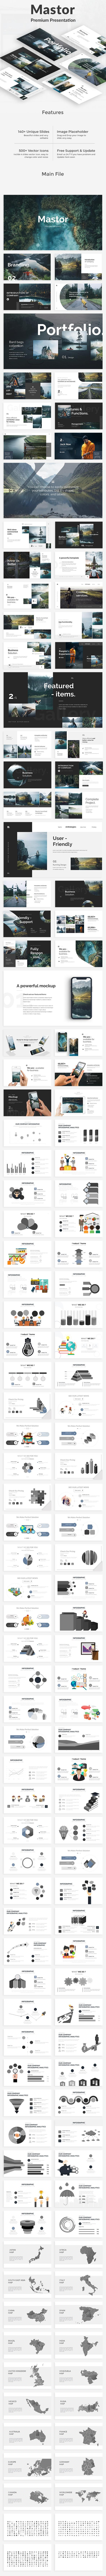 Mastor Premium Design Keynote Template - Creative Keynote Templates